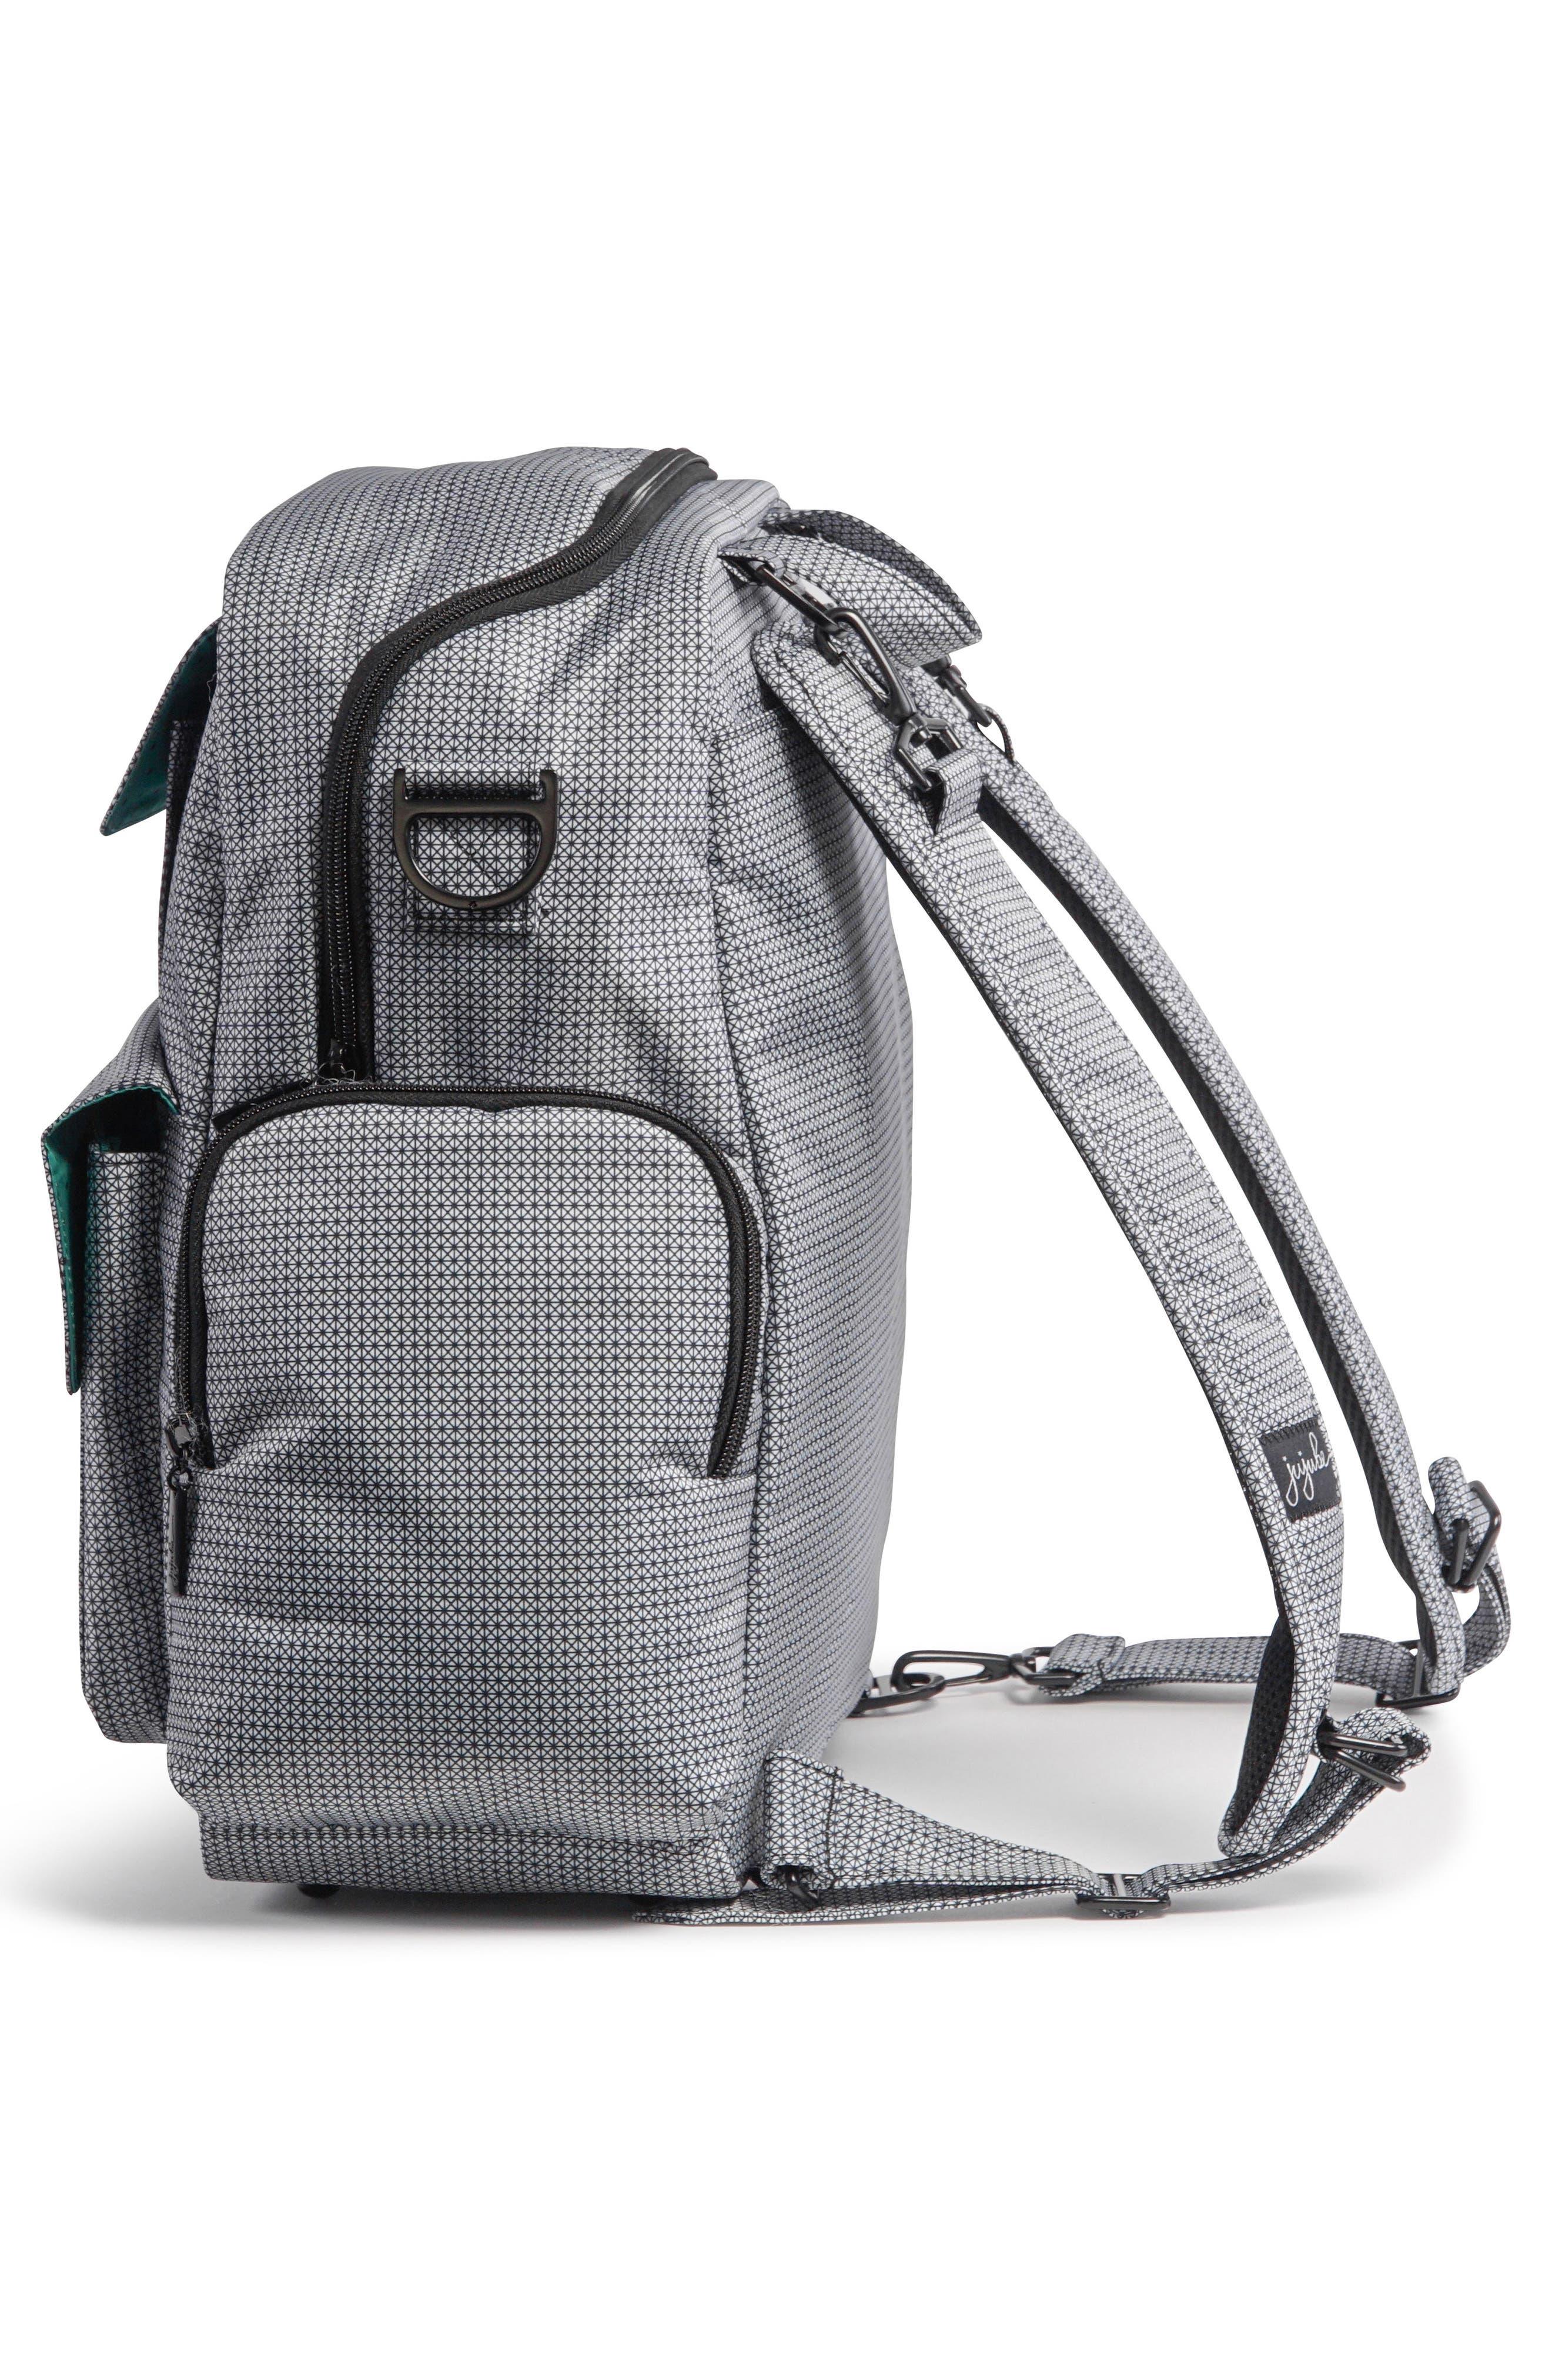 Be Nurtured Pumping Backpack,                             Alternate thumbnail 2, color,                             BLACK MATRIX